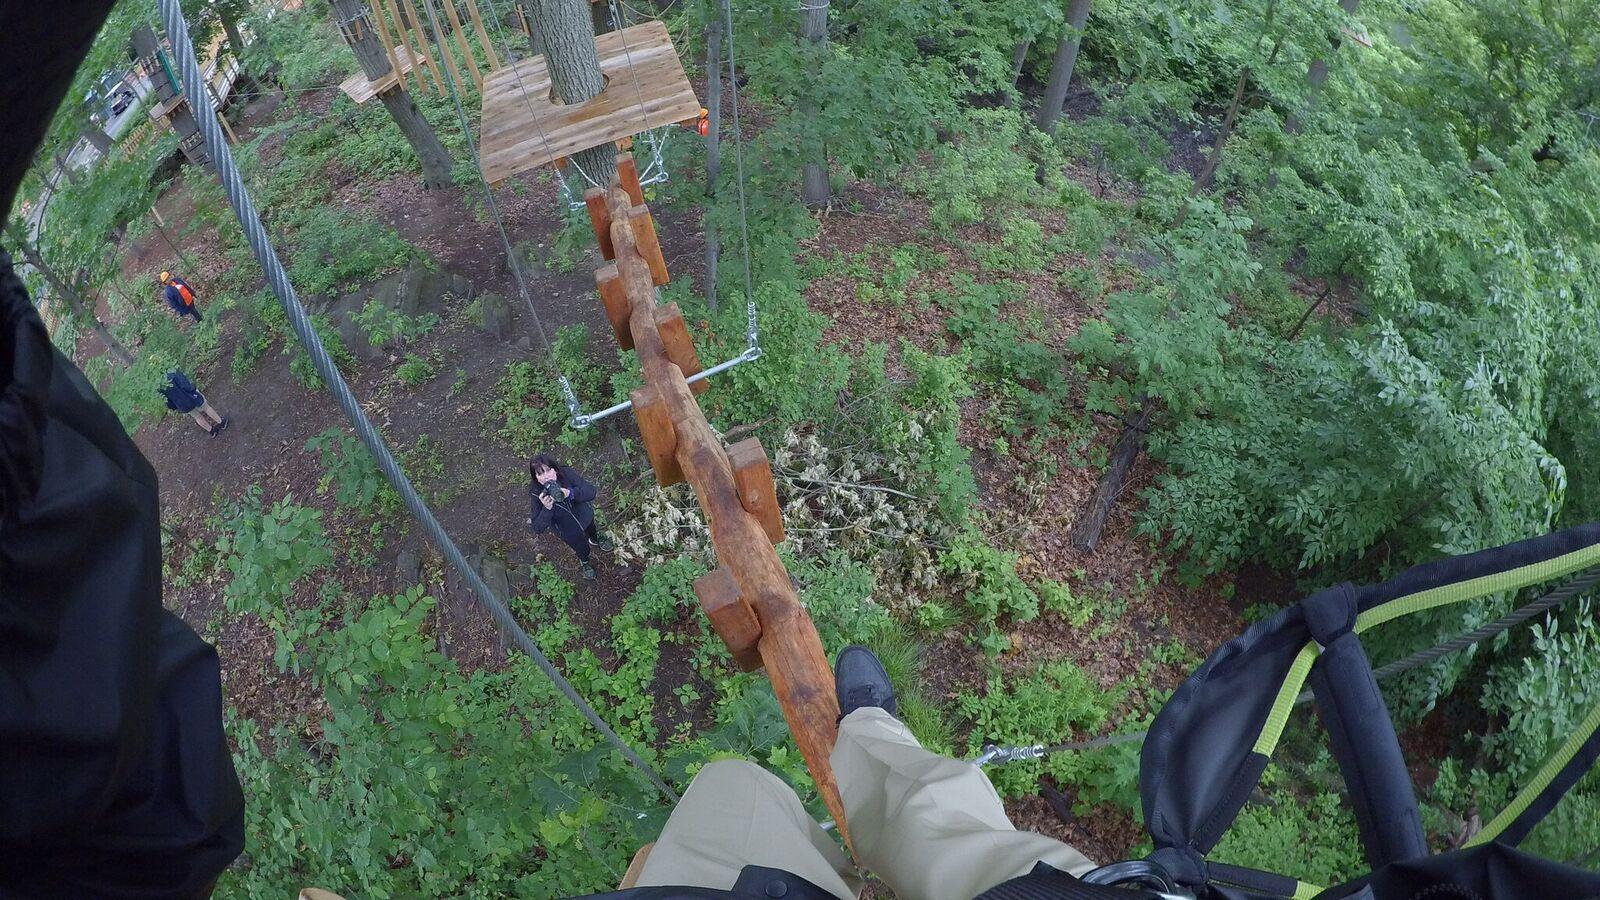 climbing at Bronx Zoo Treetop Adventure